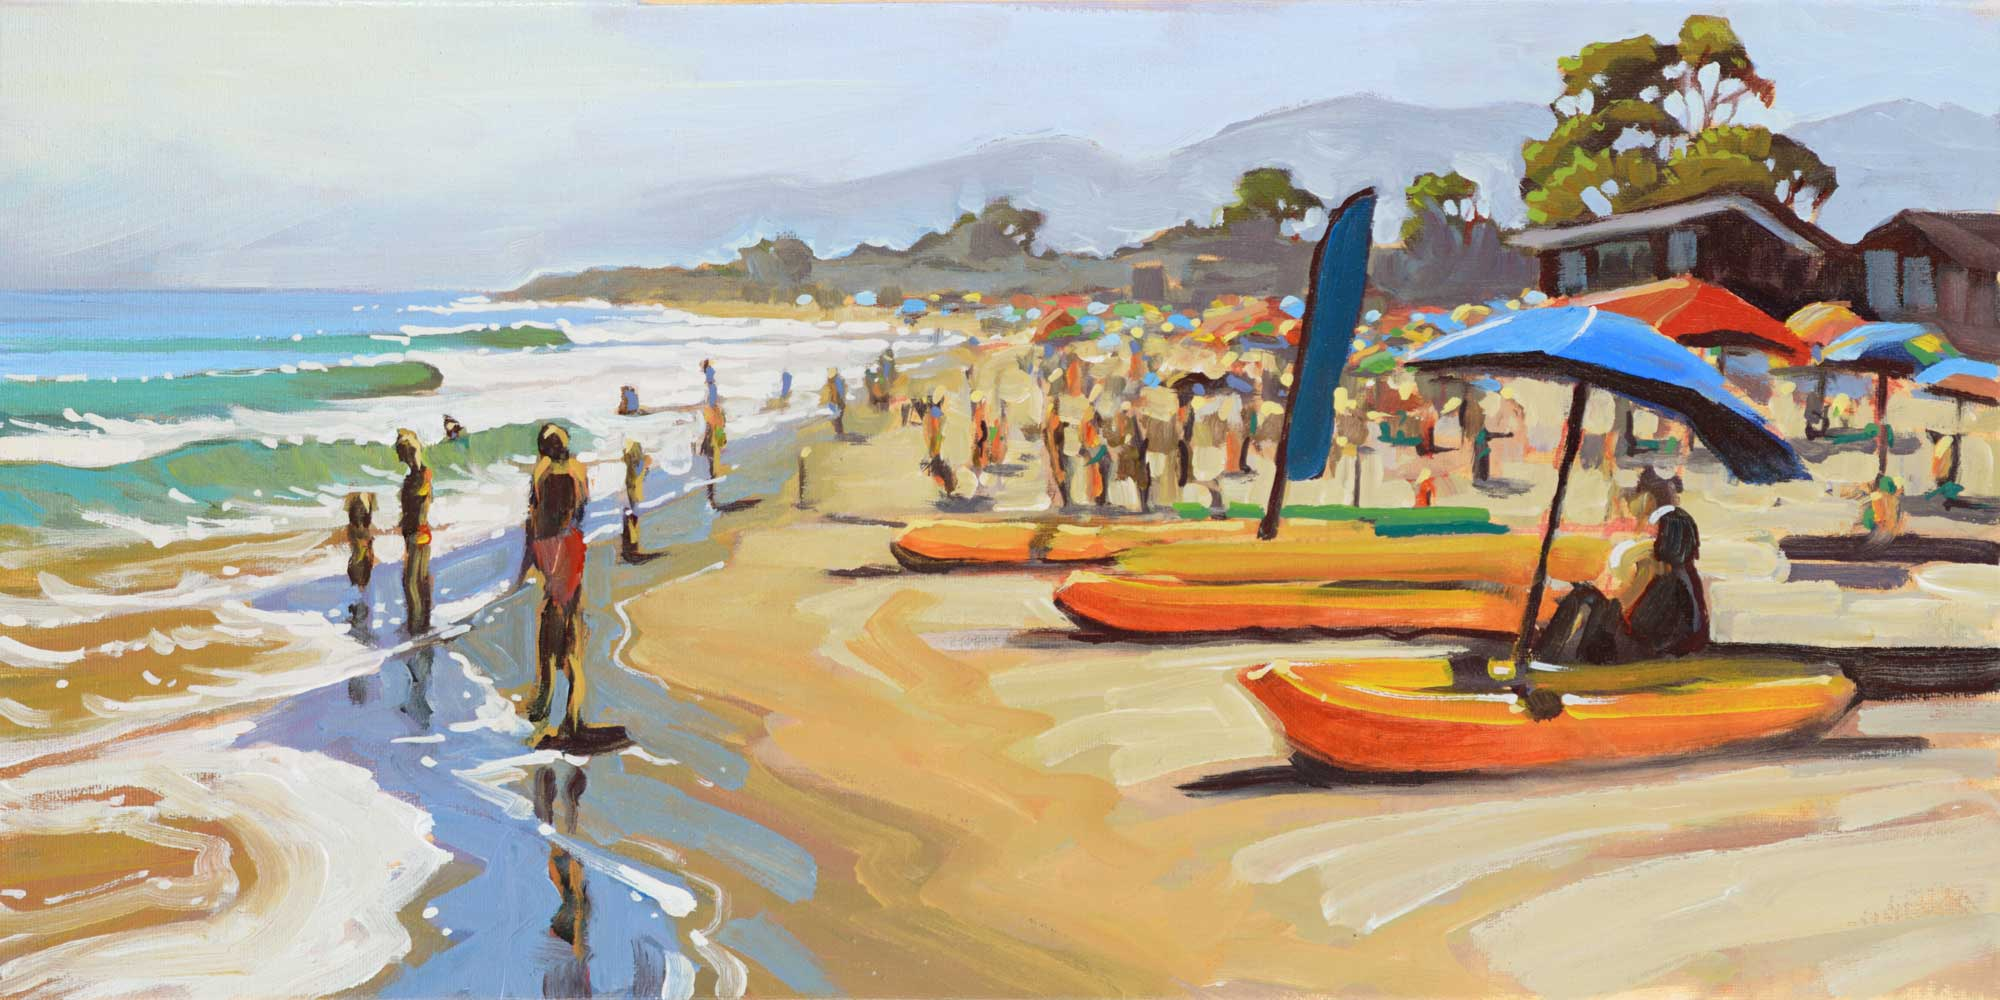 Plein air artwork of beachgoers escaping the heat at Carpenteria beach on the Santa Barbara coast of California